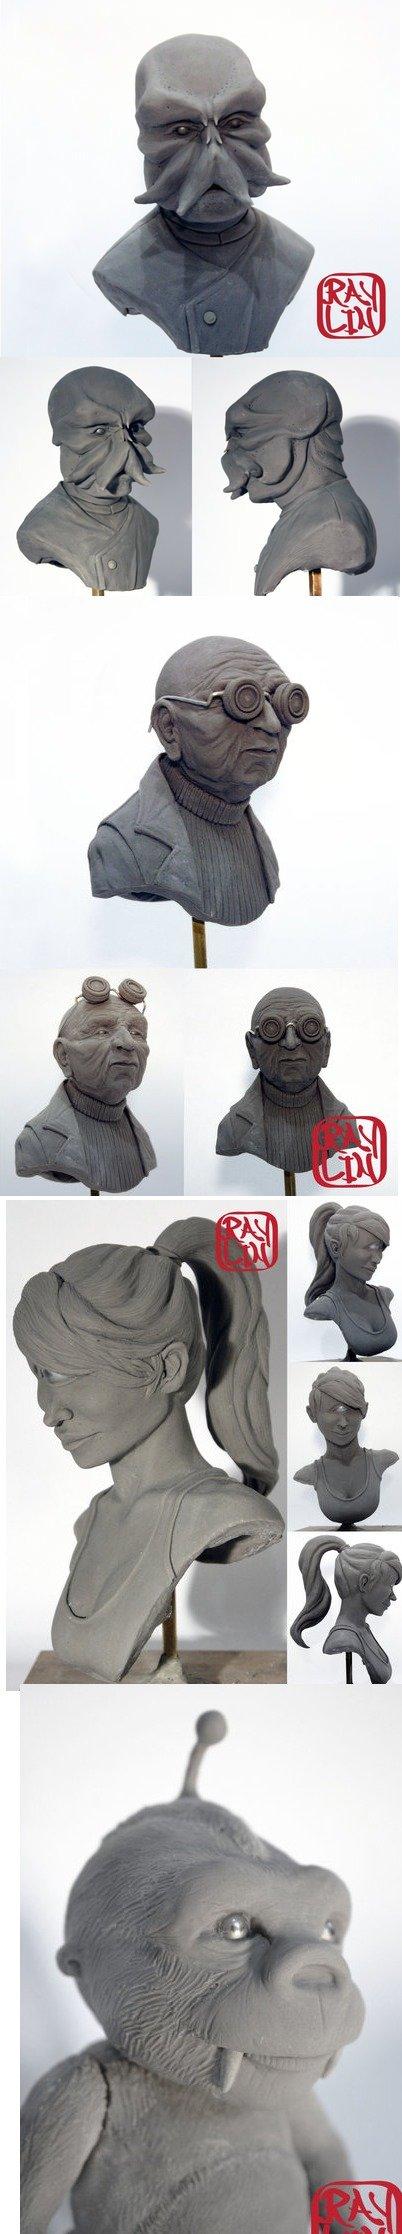 Futurama Fan Sculptures. Zoidberg, Farnsworth, Leela, Nibbler.. I couldn't resist. Futurama Fan Sculptures Zoidberg Farnsworth Leela Nibbler I couldn't resist